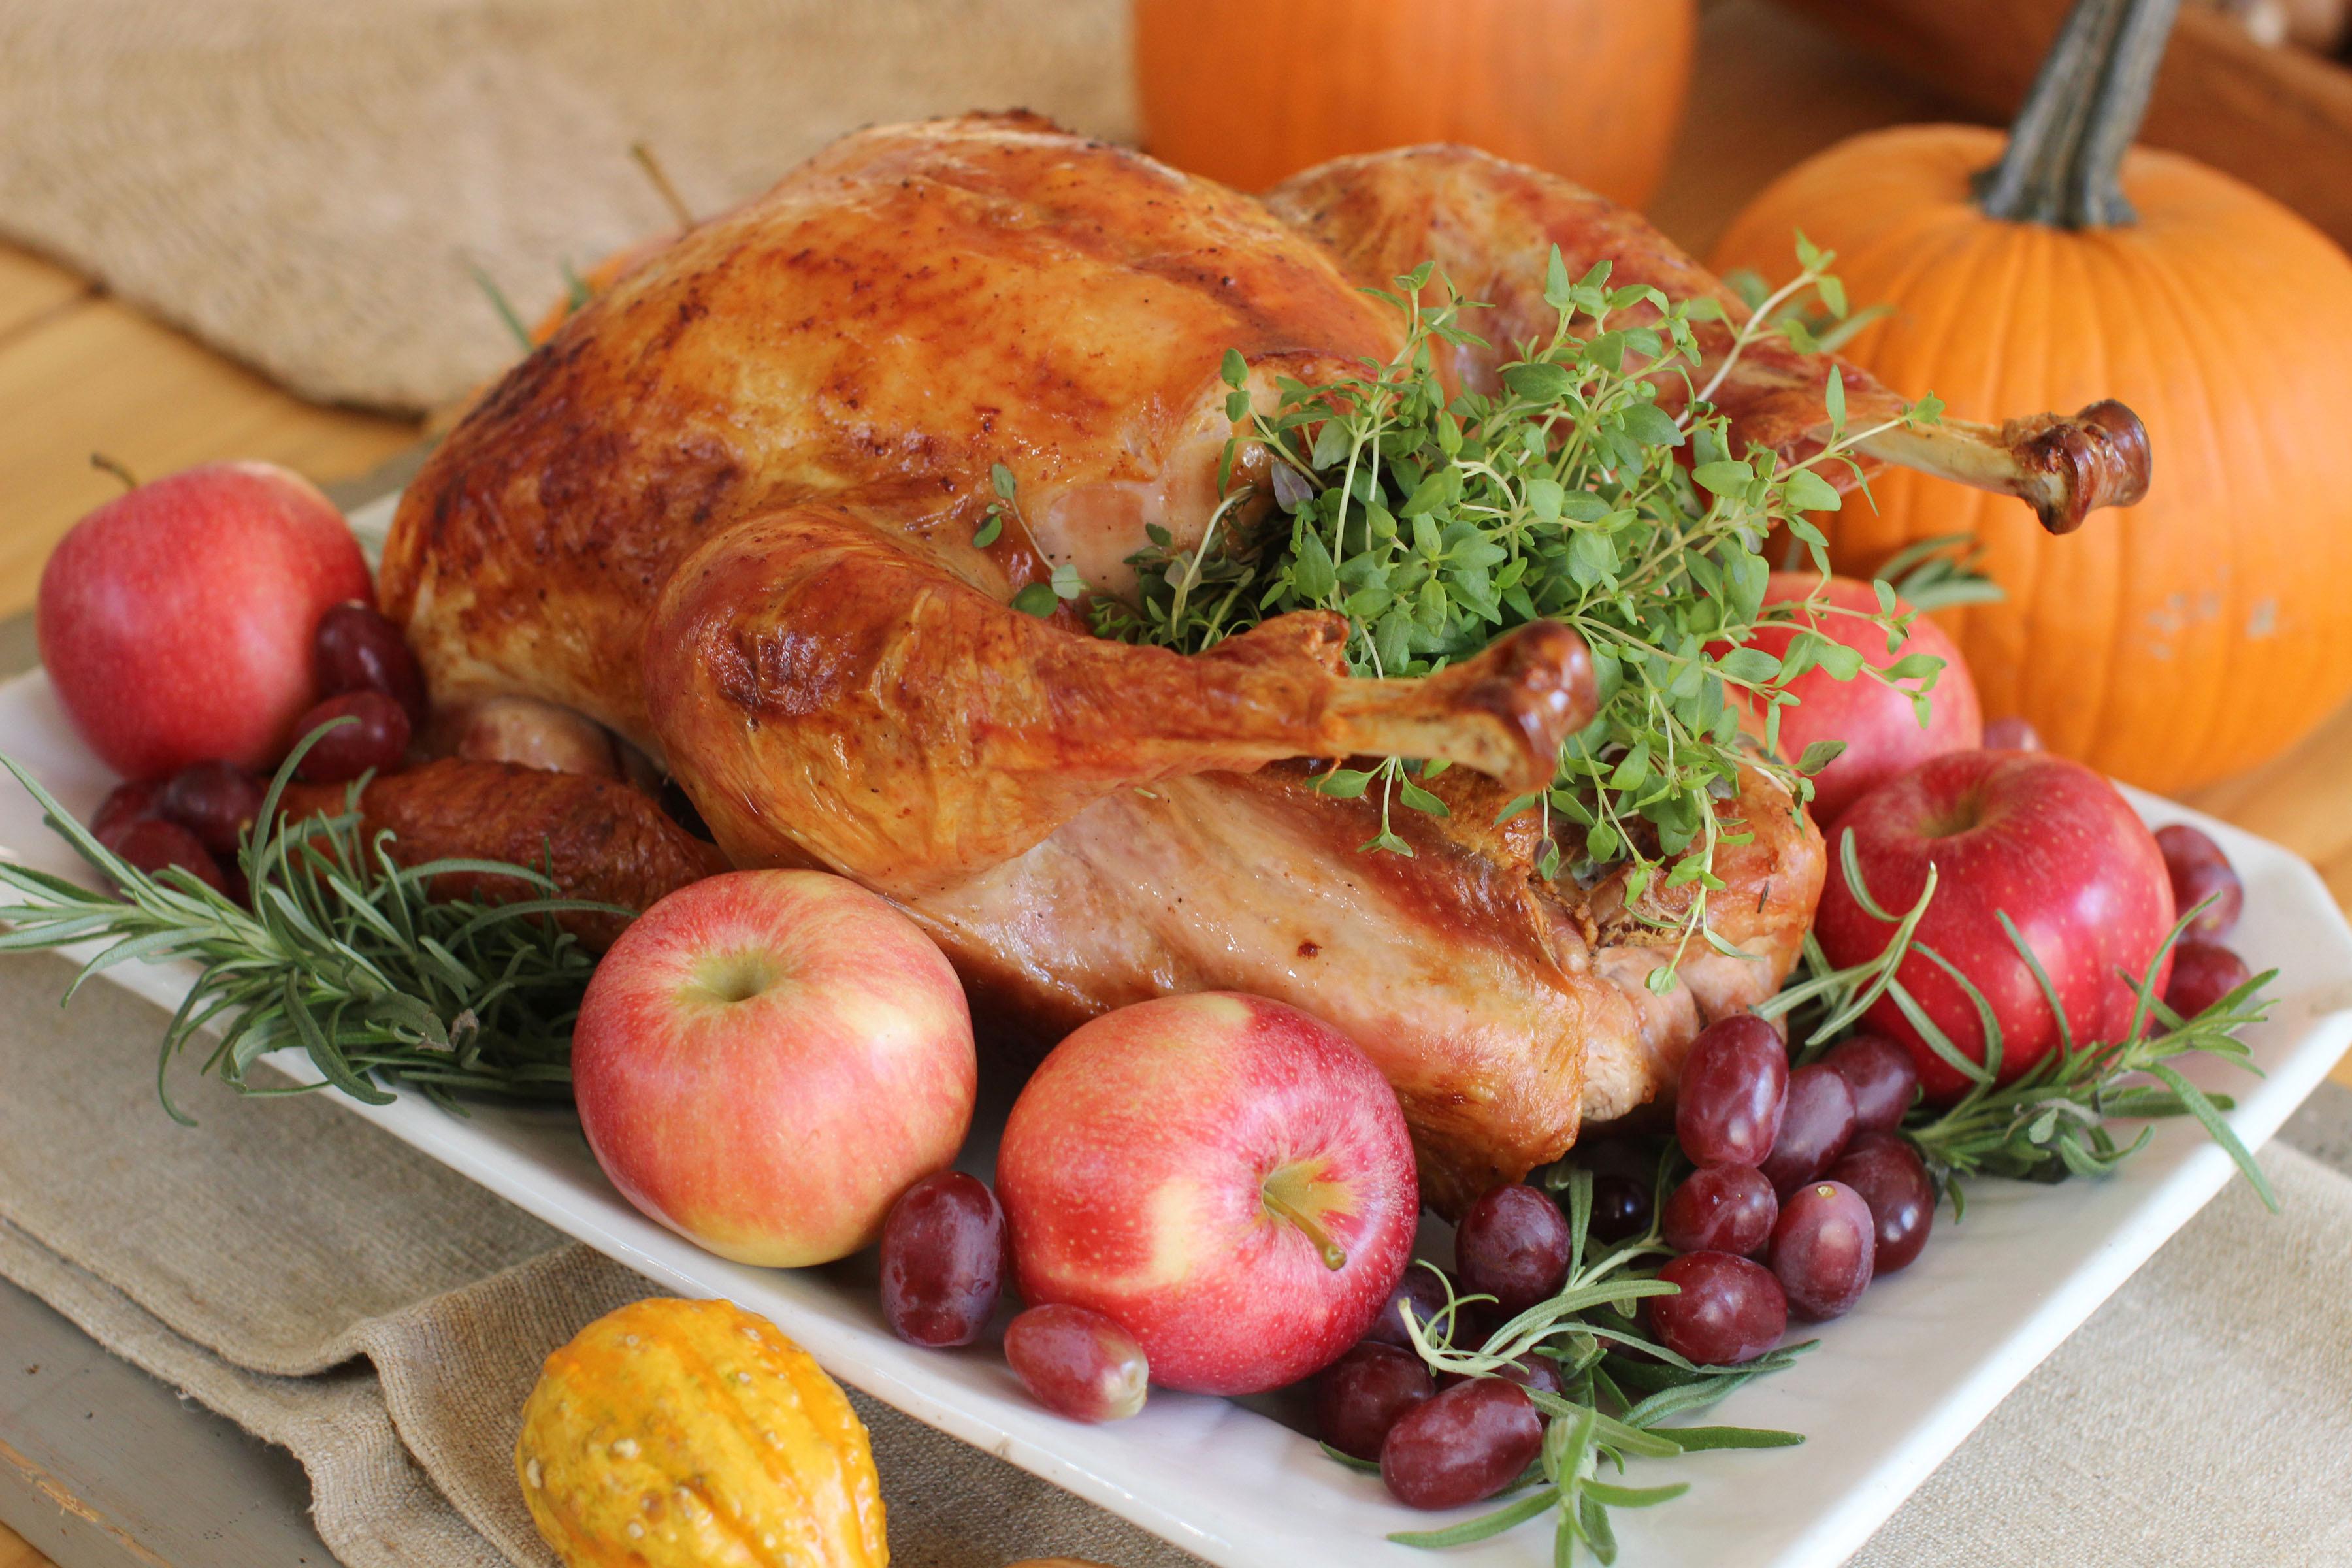 Forget how Grandma did it: USDA says don't wash the turkey